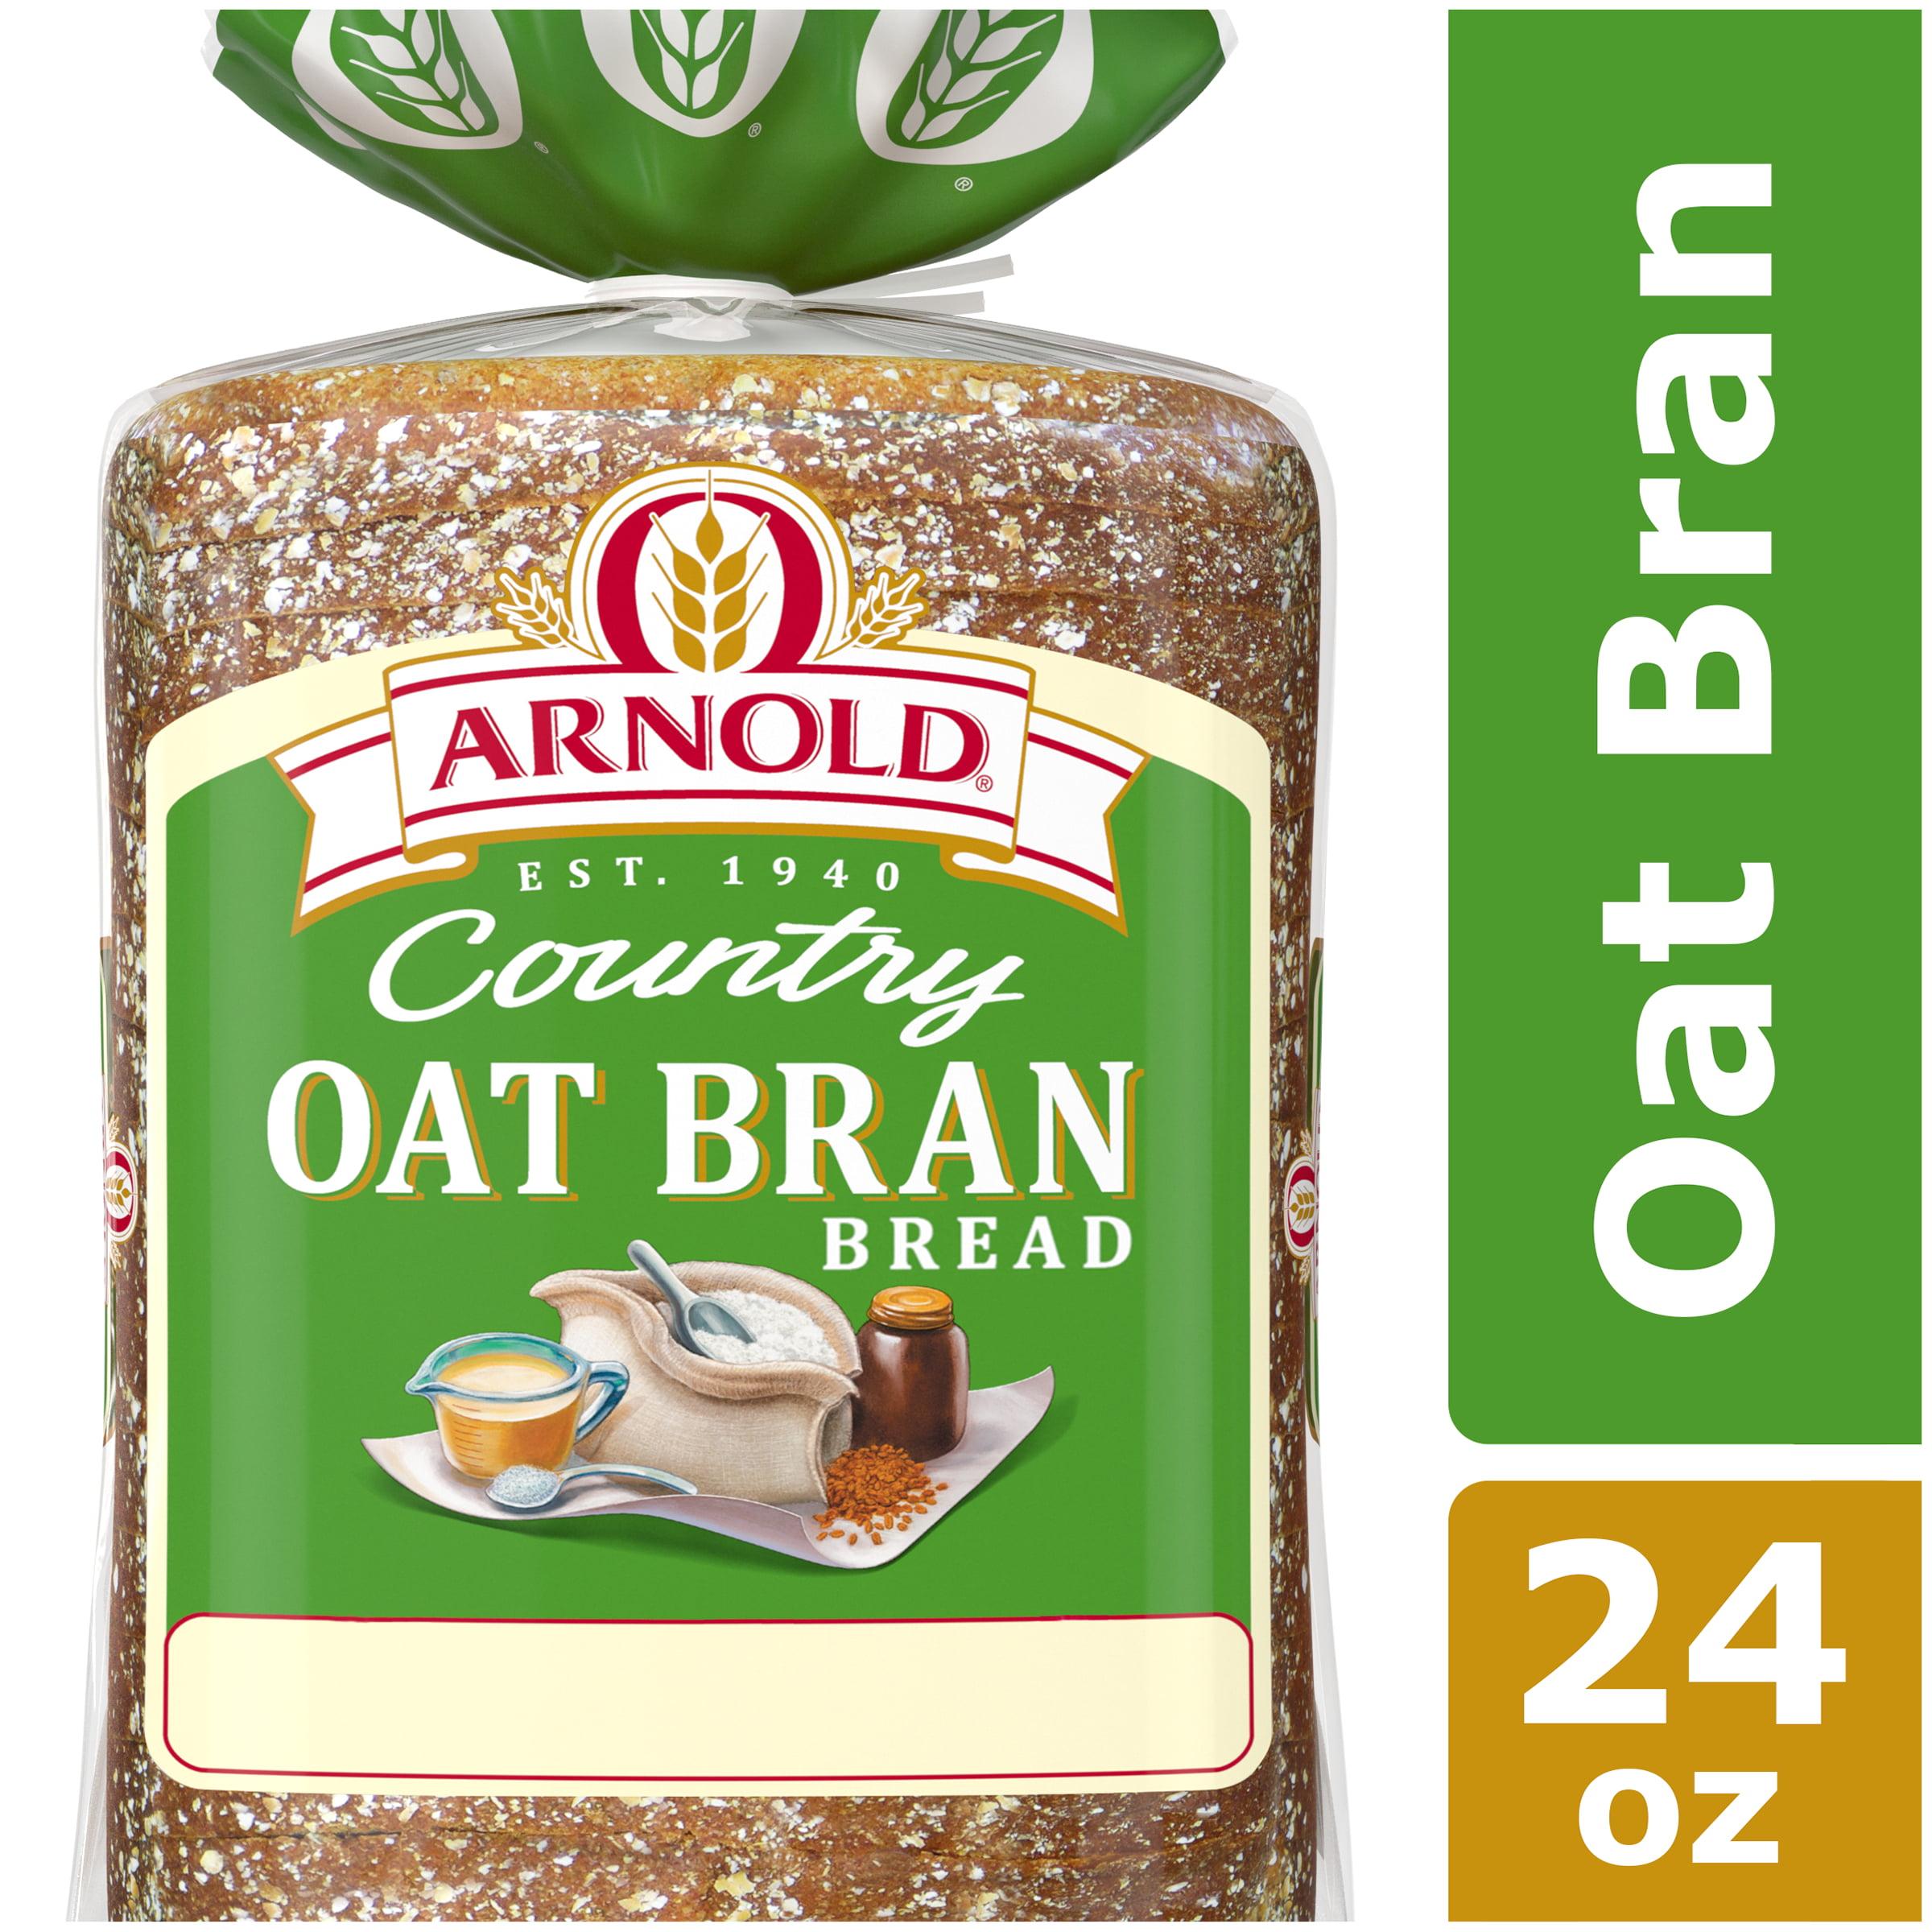 Arnold Country Oat Bran Bread, Hearty Flavor, 24 oz